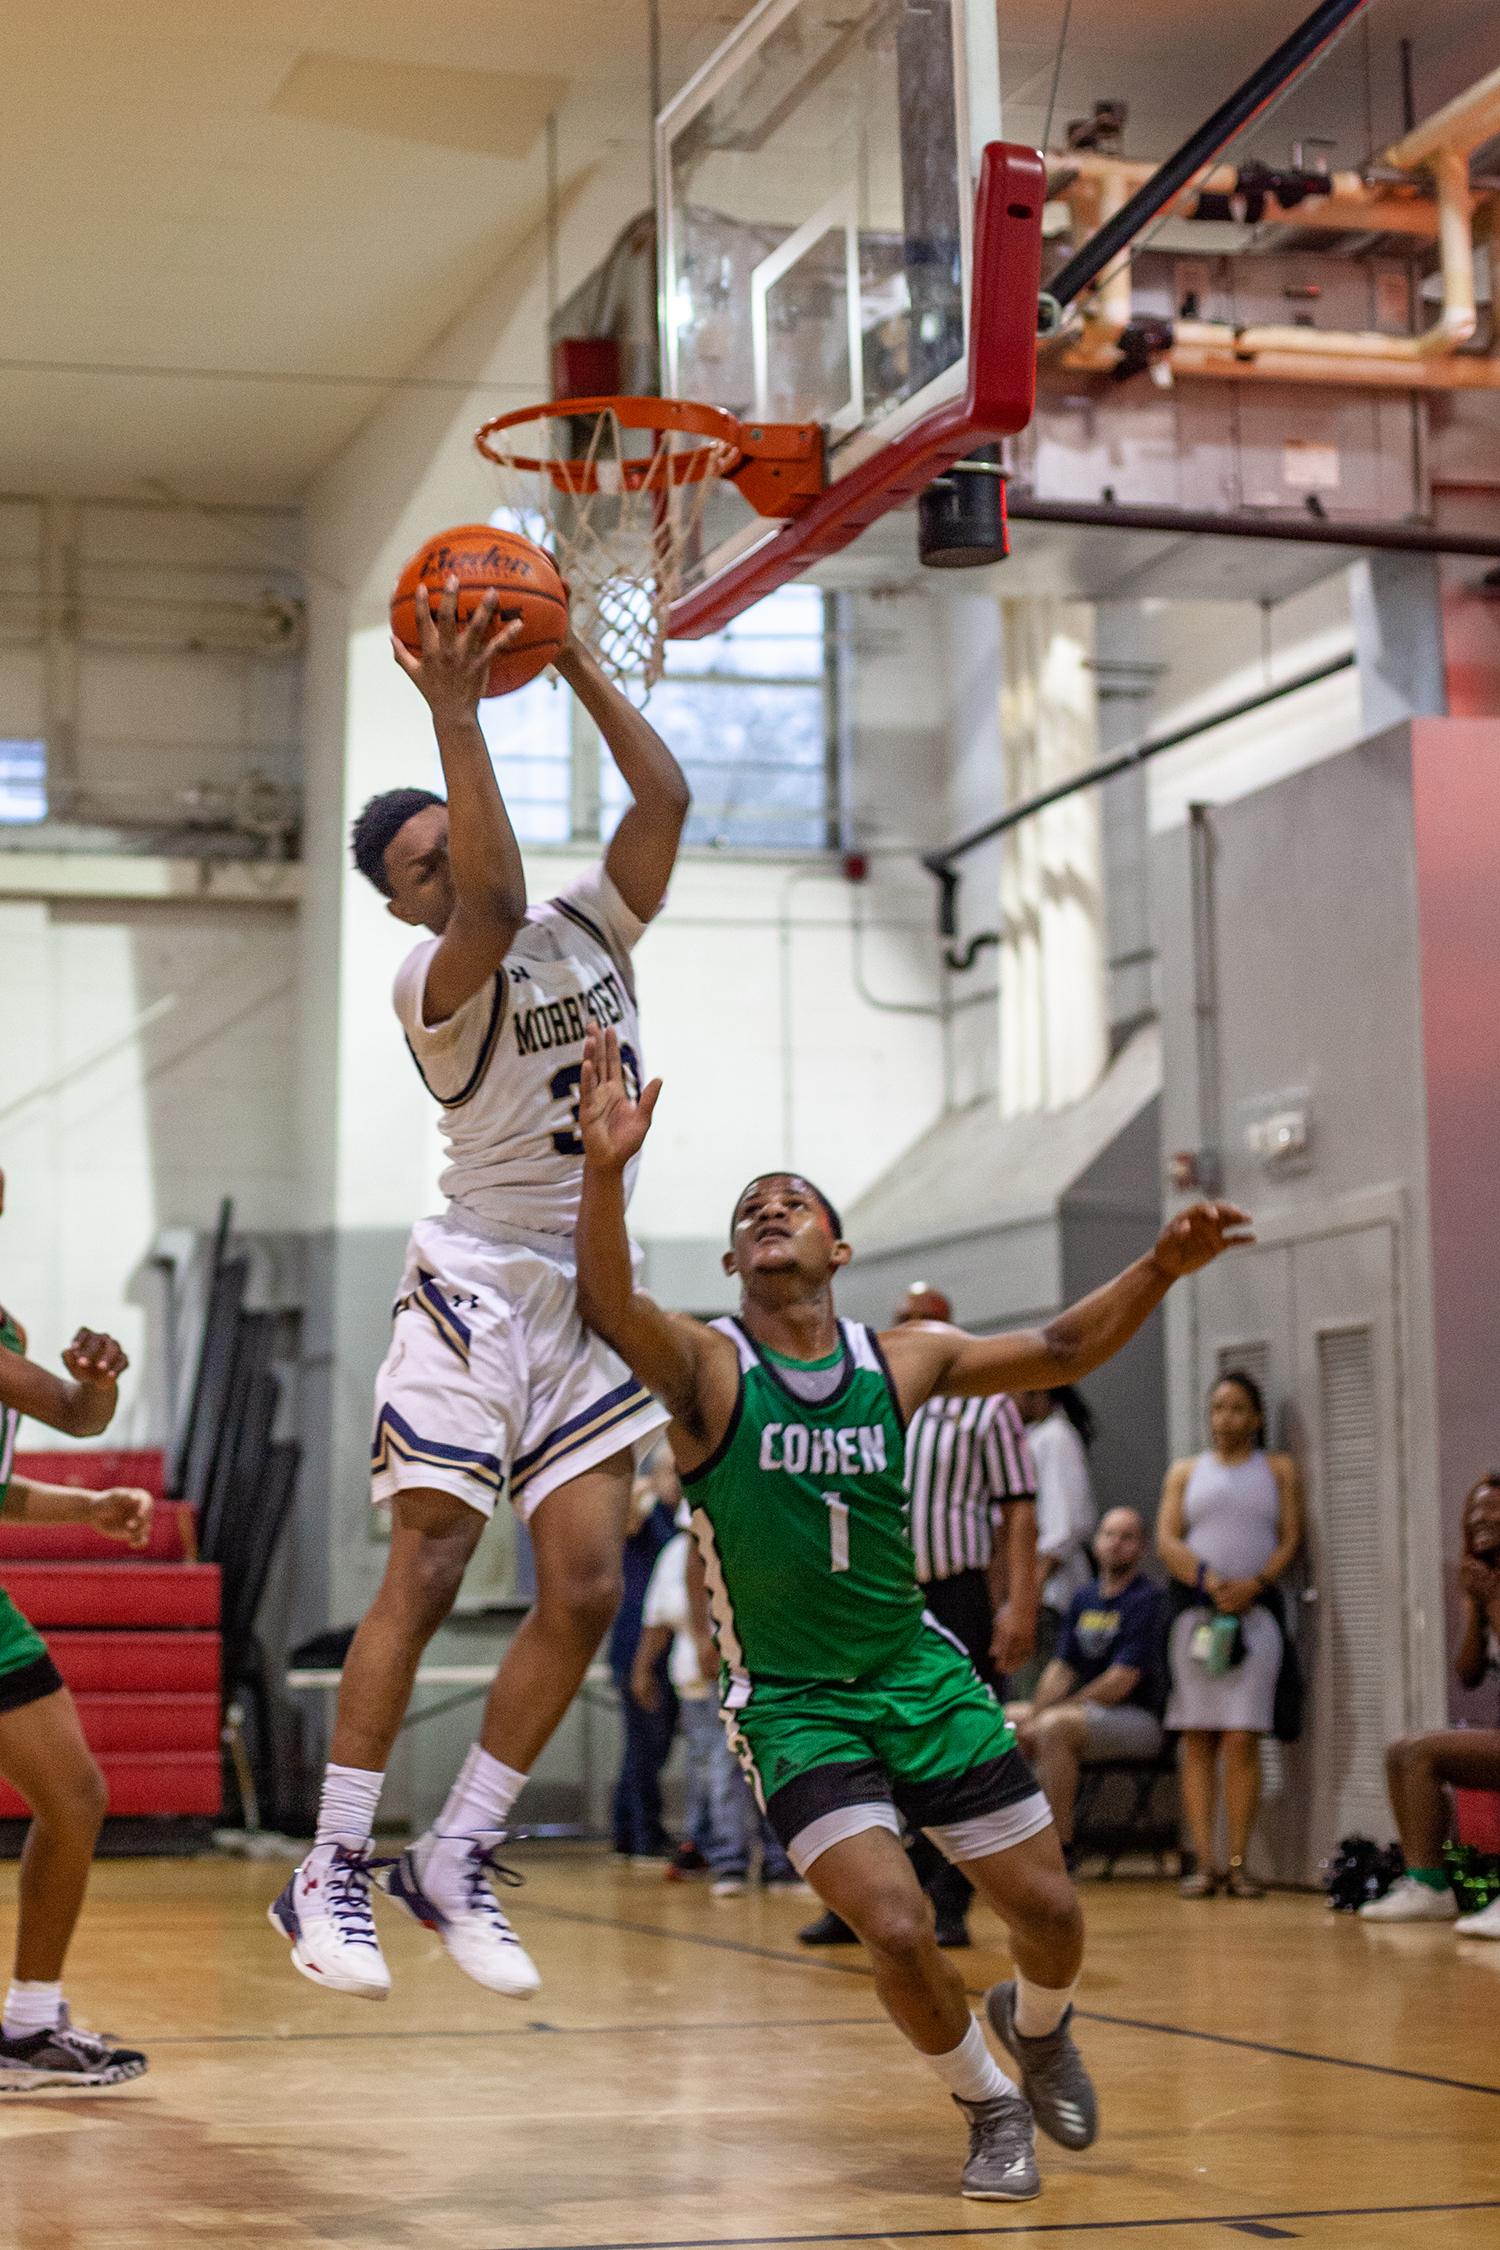 Morris Jeff - Basketball